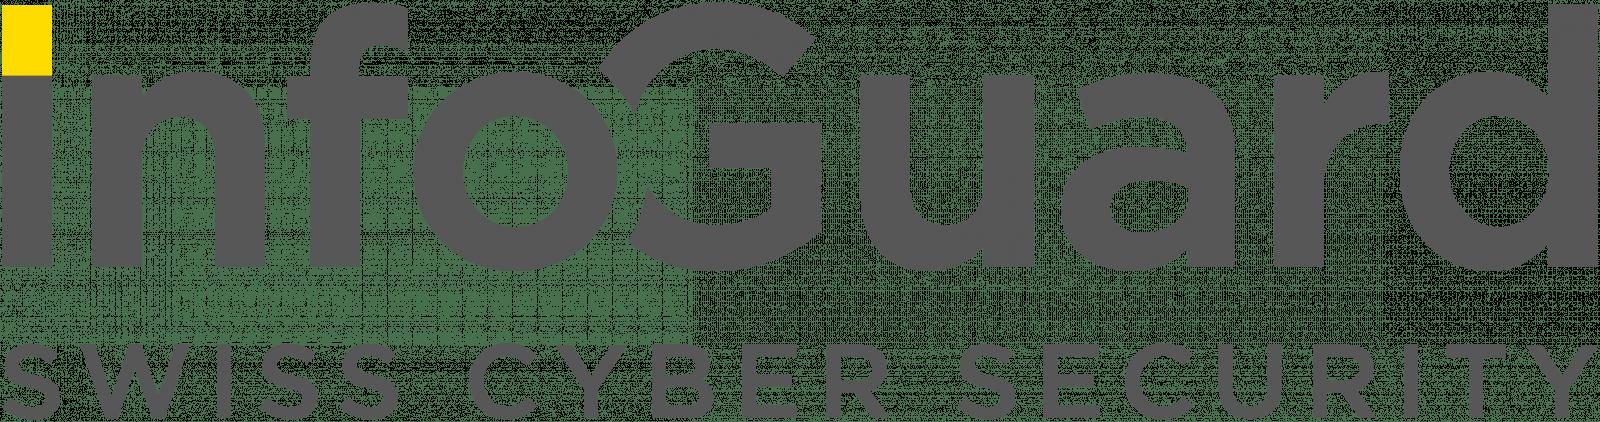 Swiss Cyber Security Blog